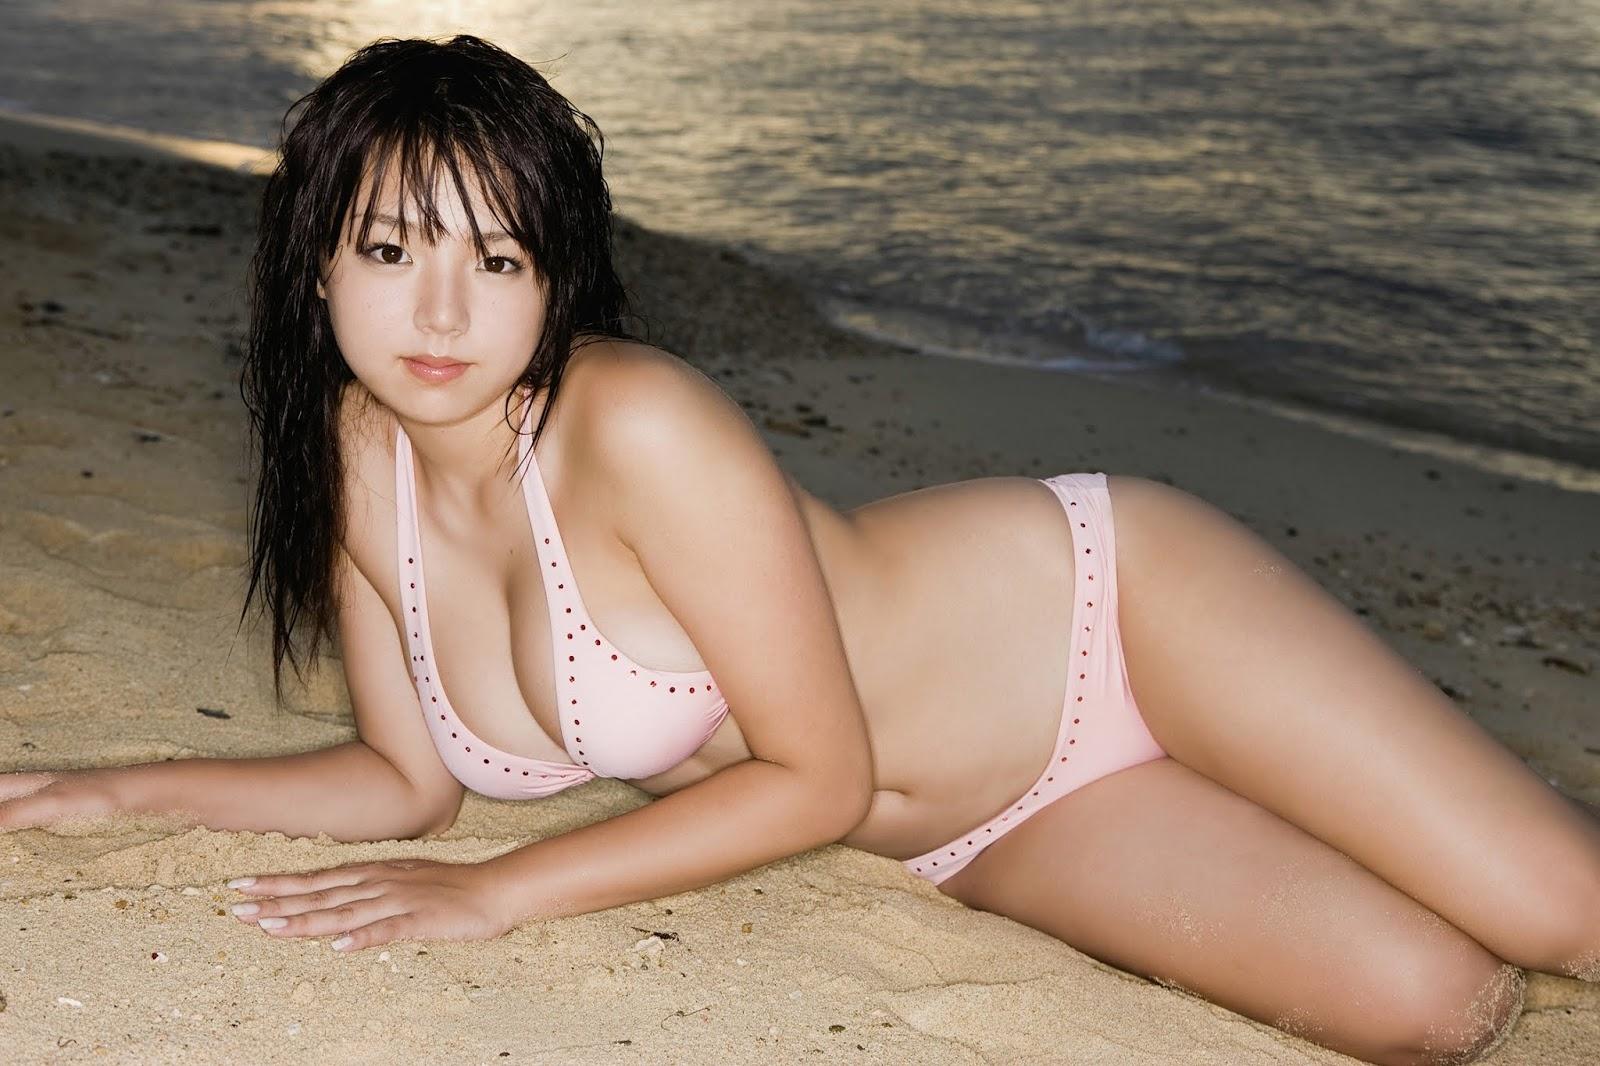 Bent over nude filipina girls